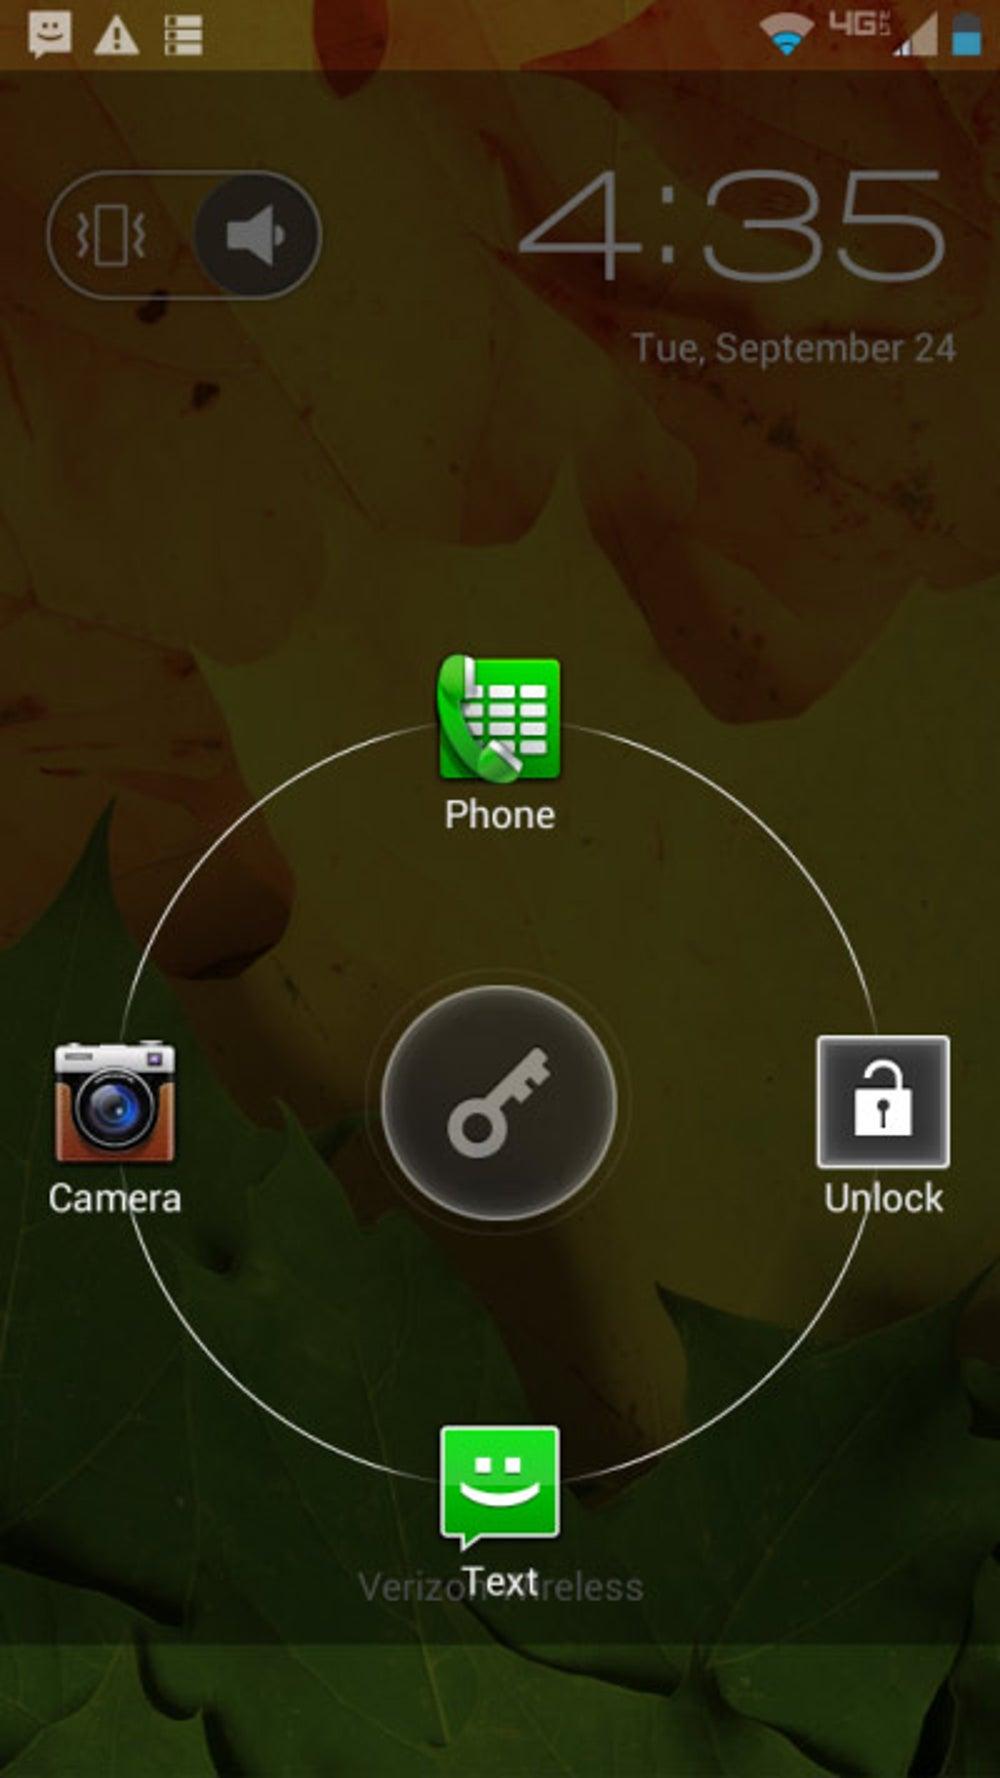 Unlock options